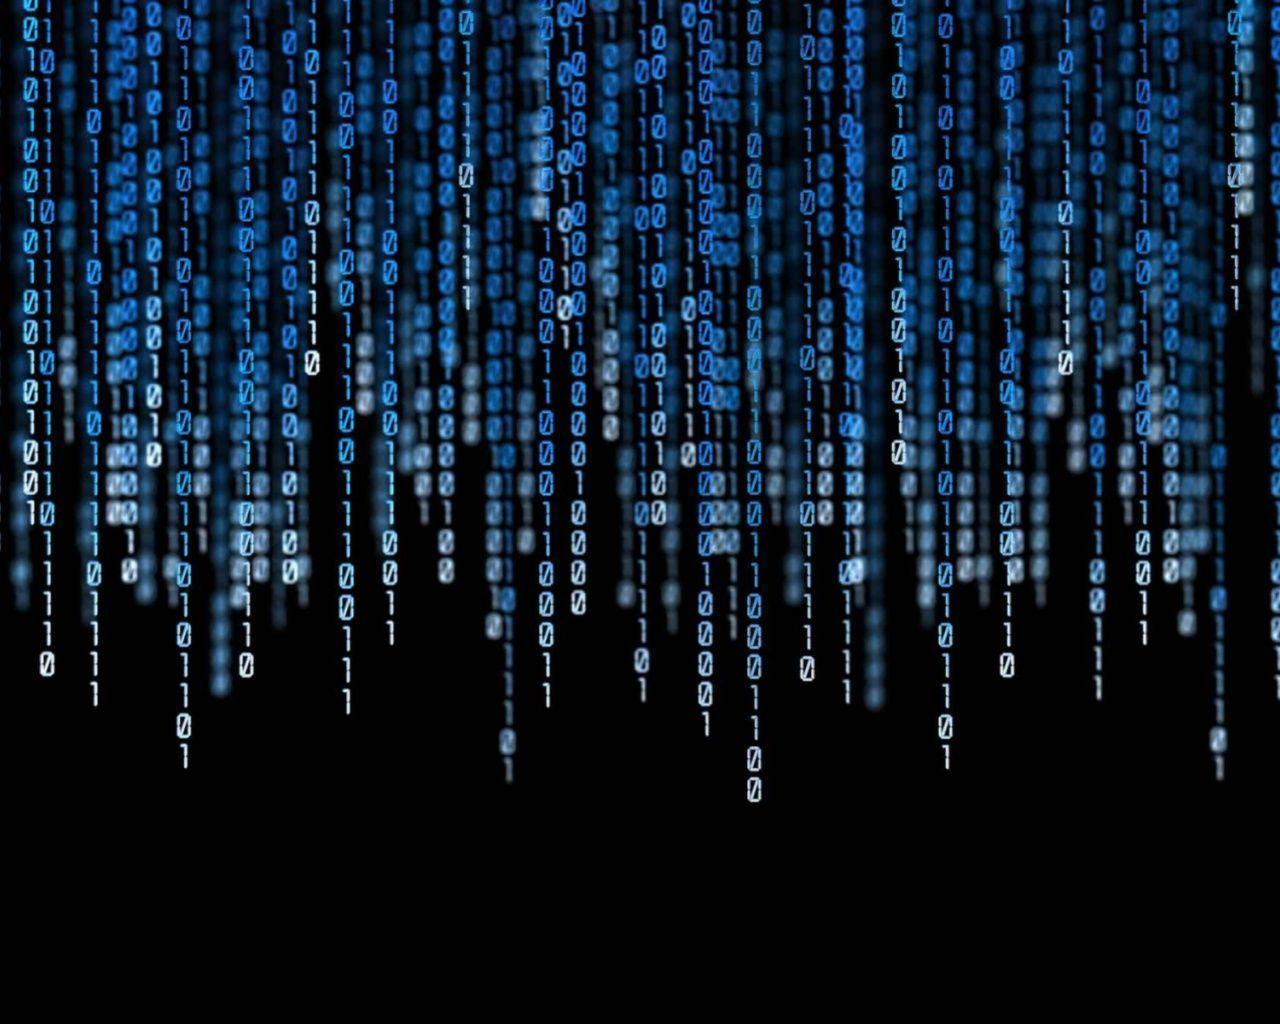 Binary Code Wallpapers 1280x1024